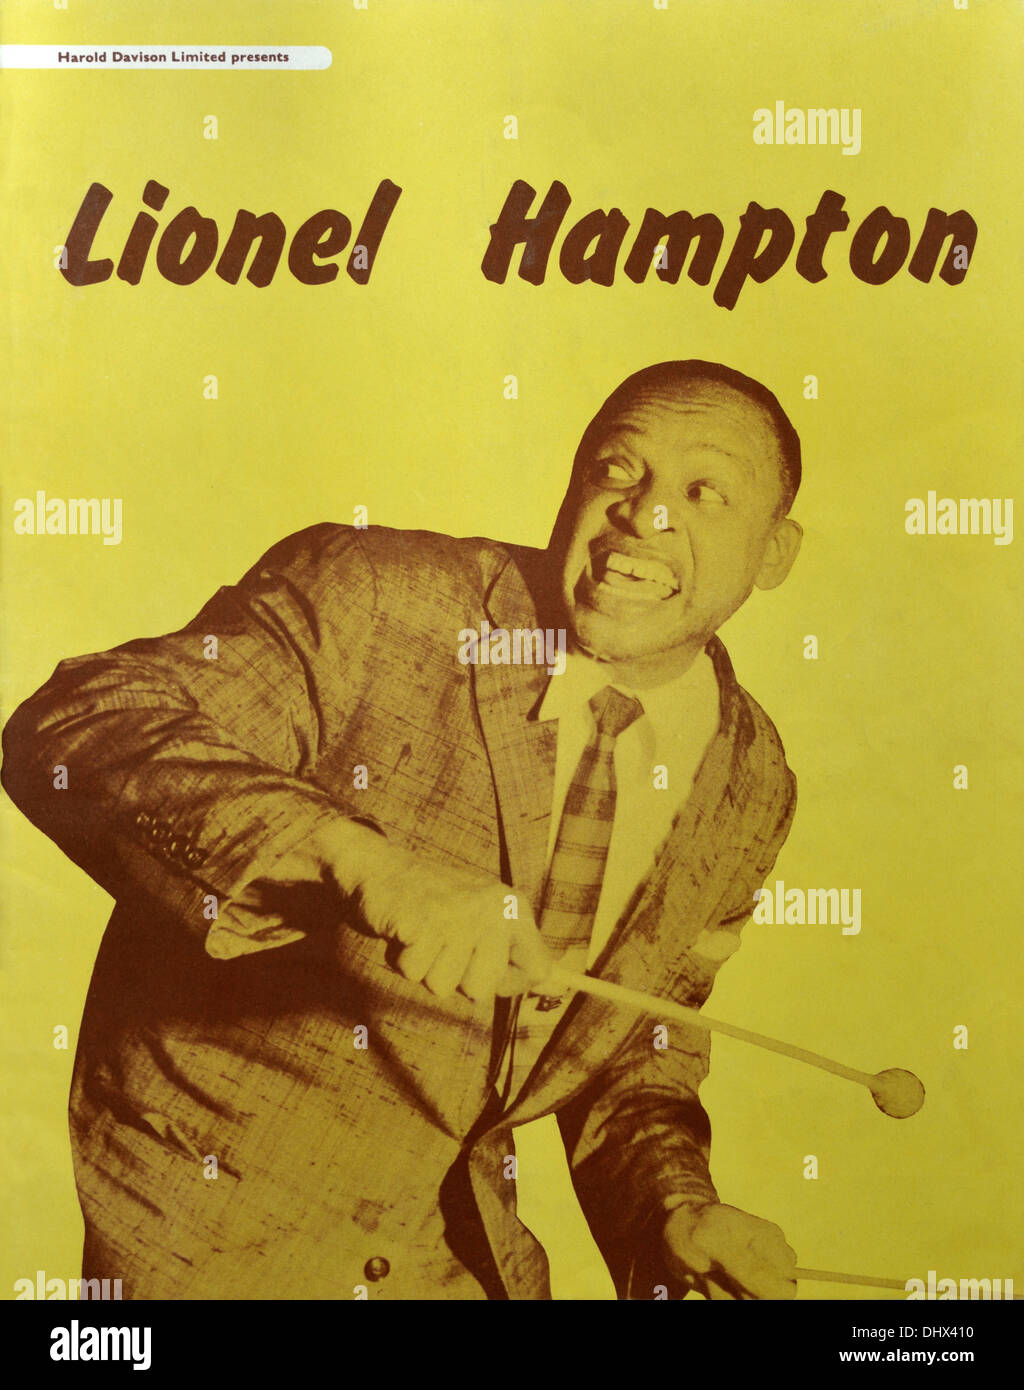 Jazz concert programme. Harold Davison Limited presents Lionel Hampton. British Tour 1956. - Stock Image